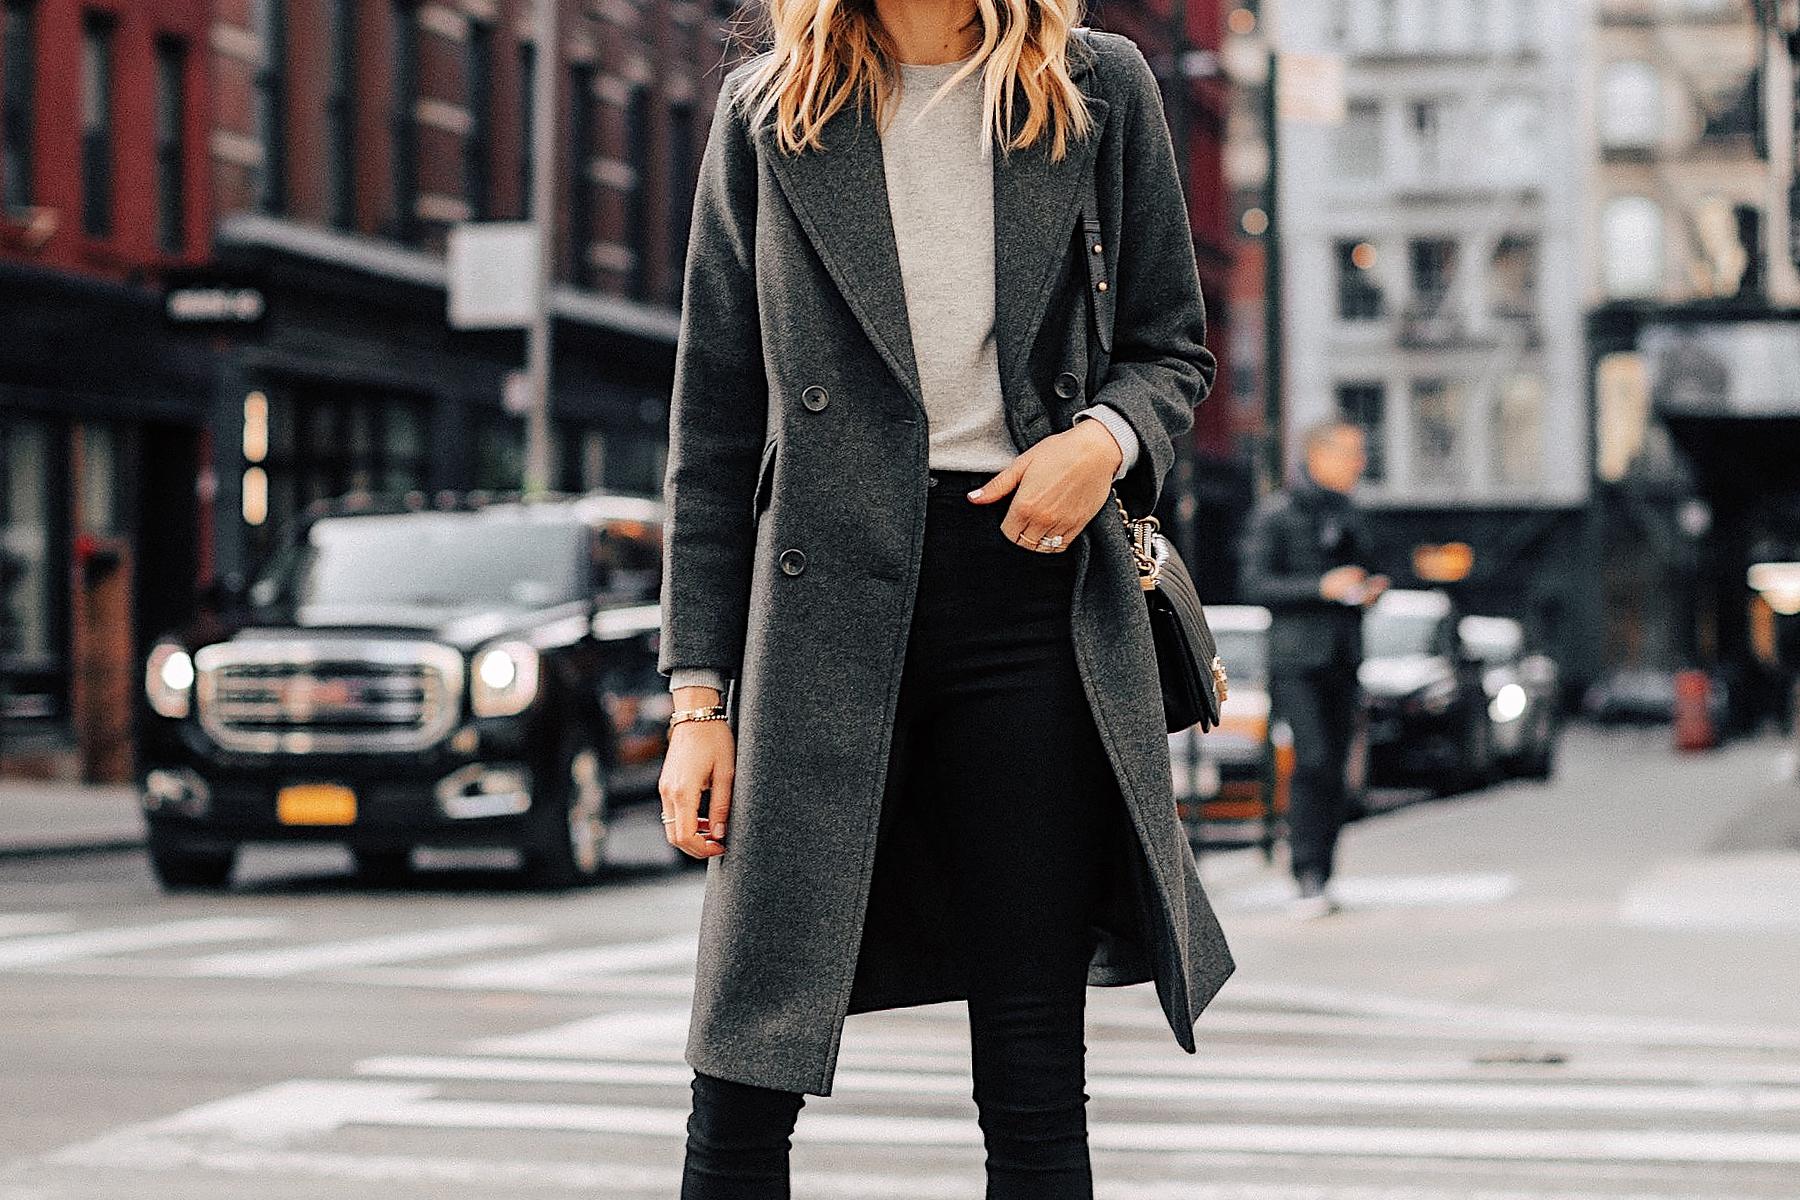 Fashion Jackson Wearing Grey Everlane Wool Overcoat Grey Sweater Black Skinny Jeans